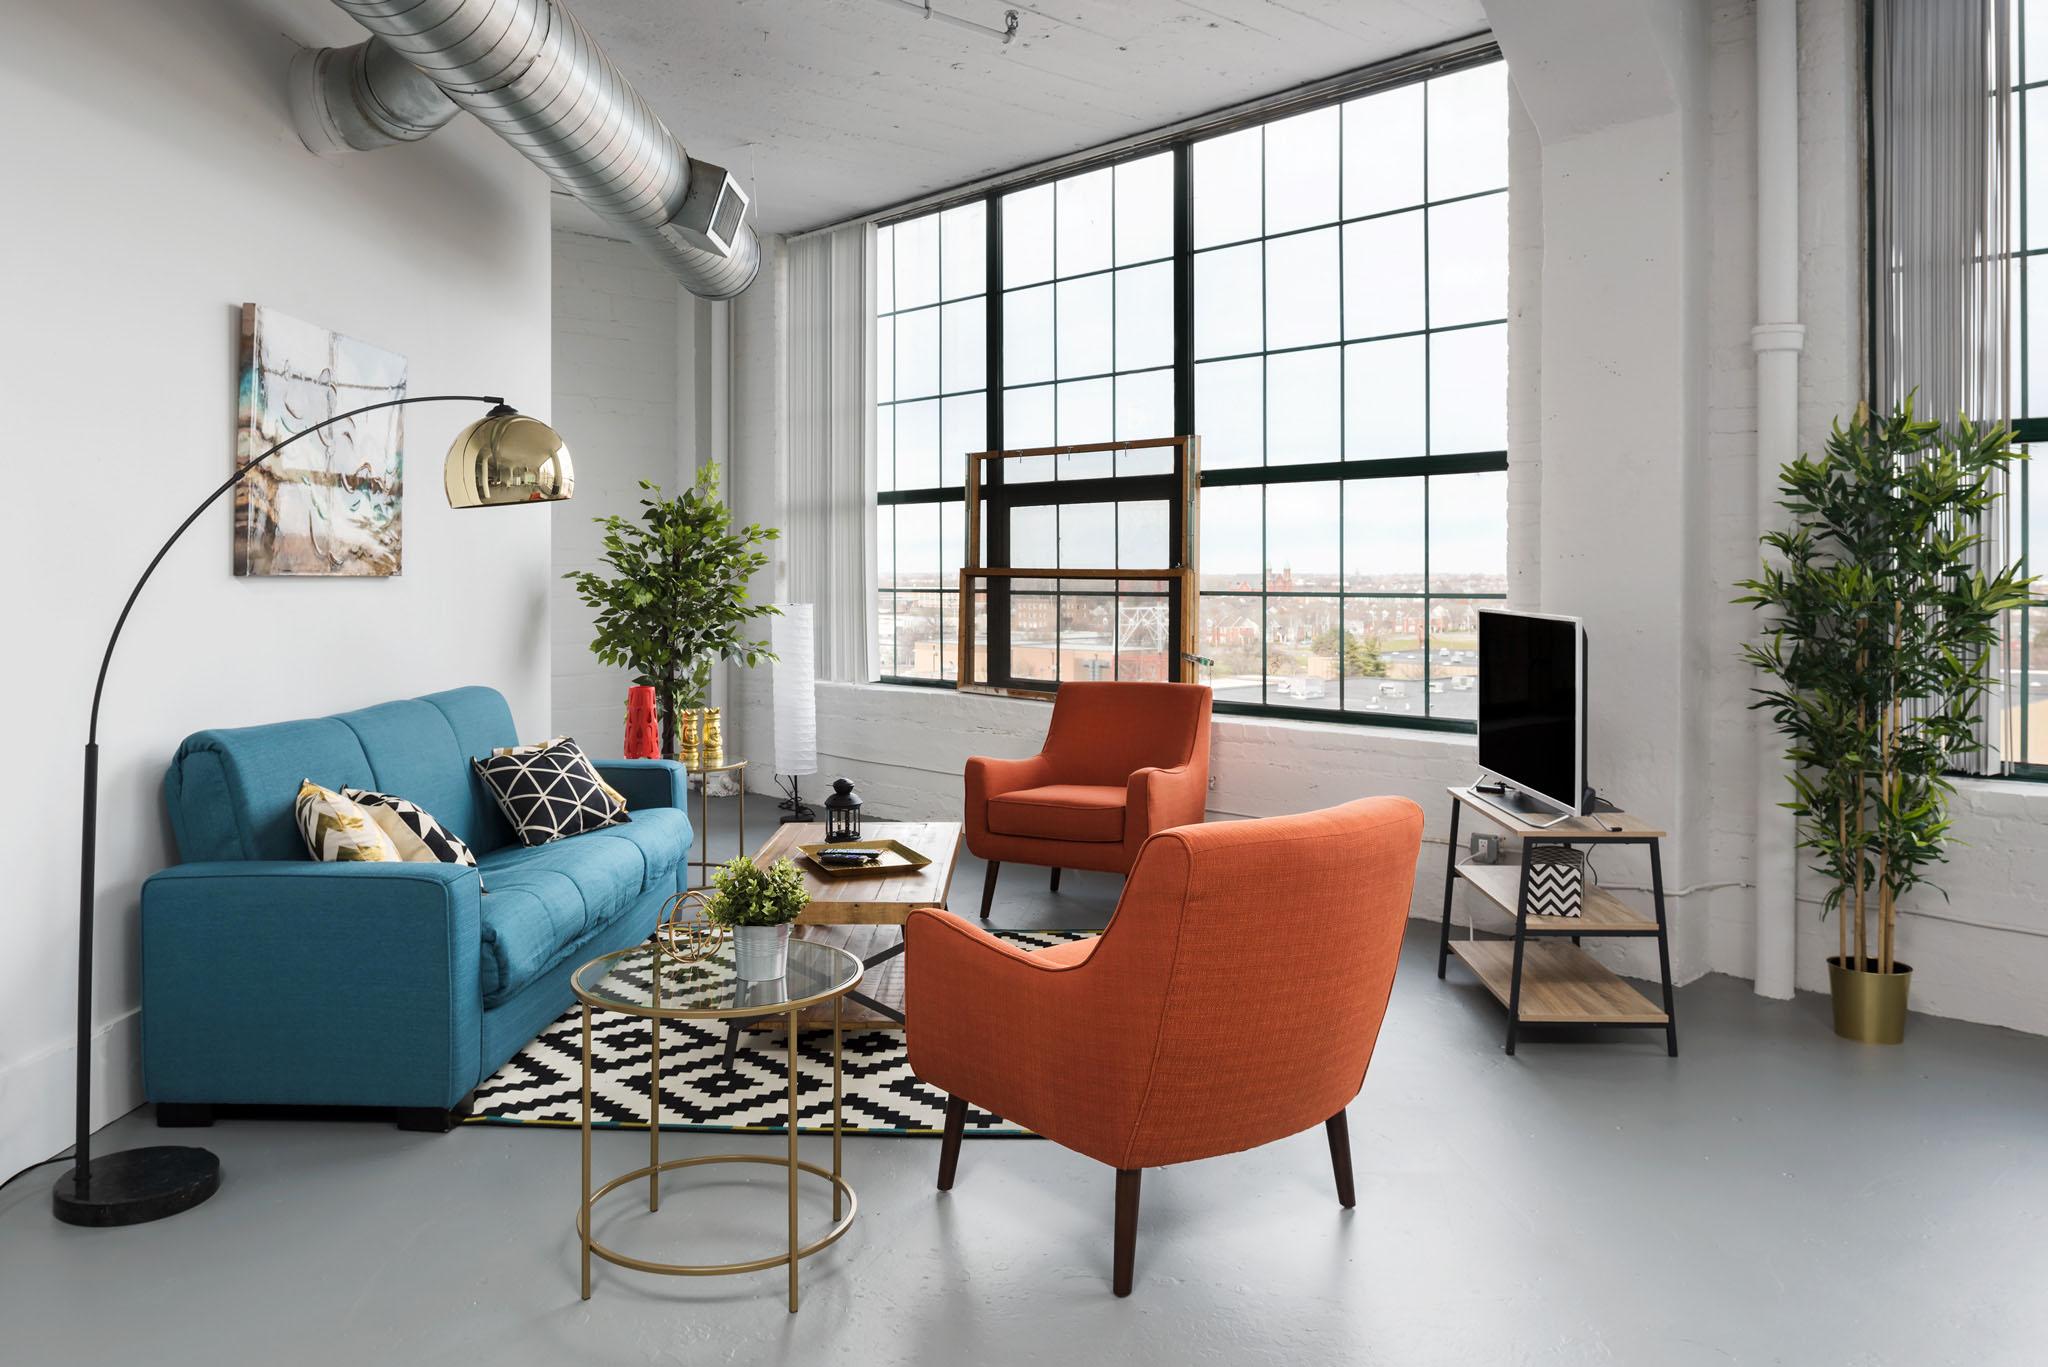 Apartment_photography 1.jpg